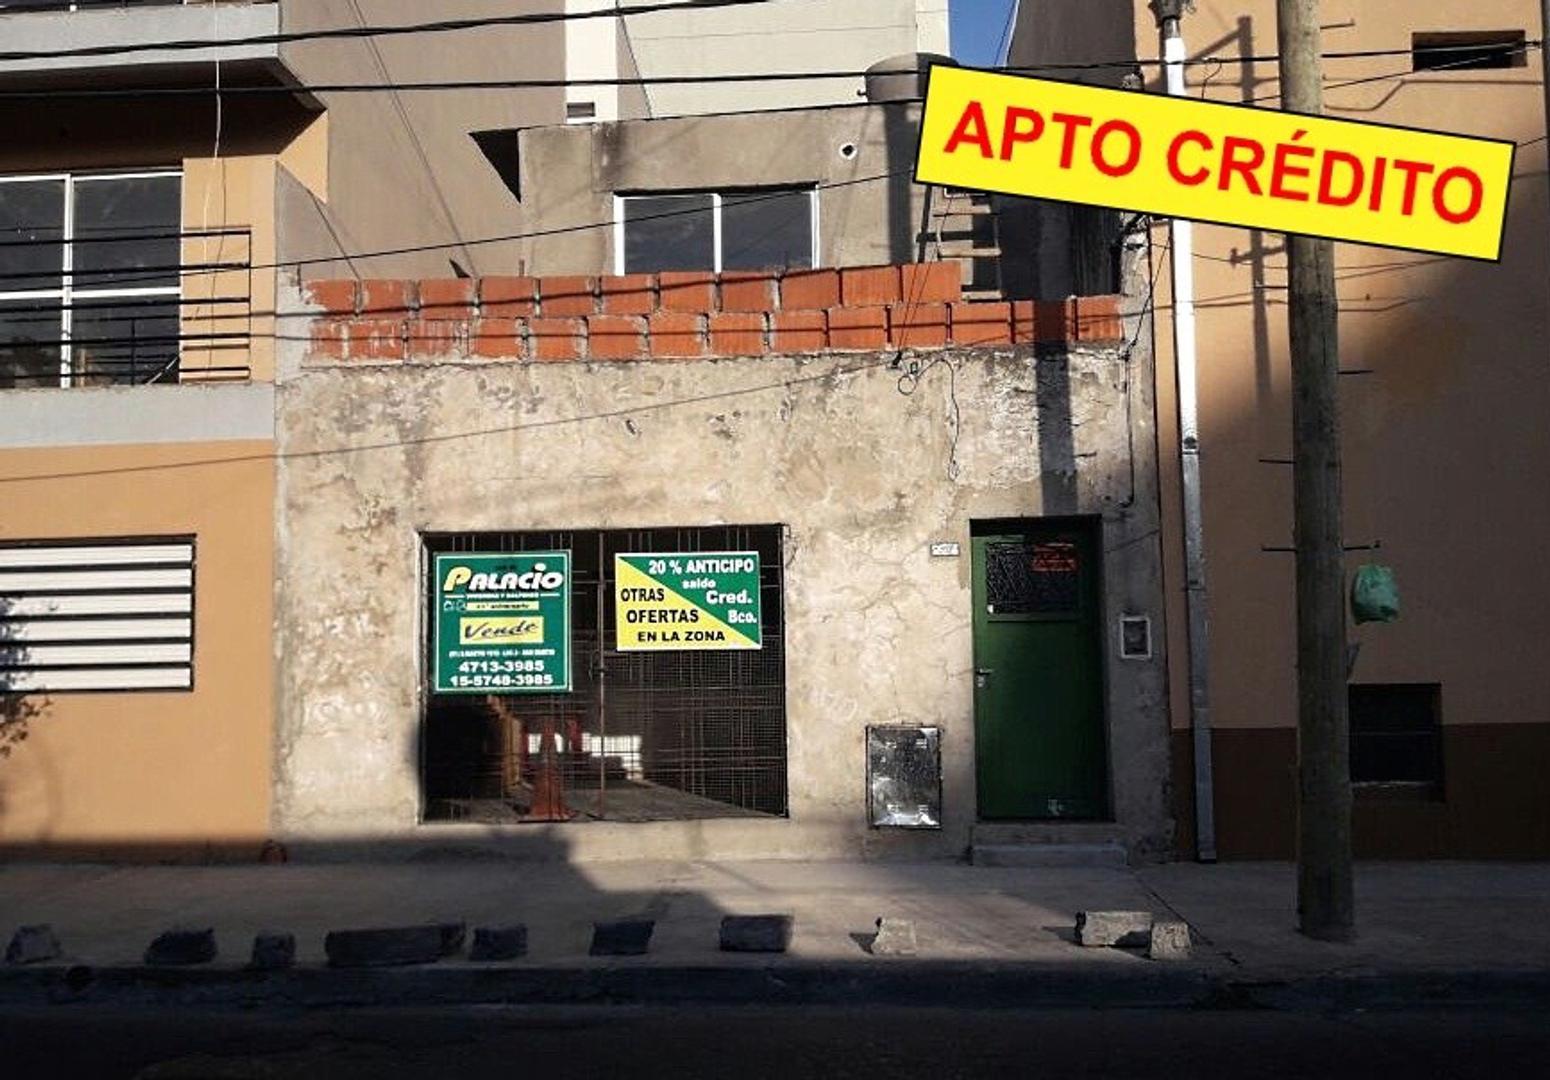 CASA 3 AMBIENTES APTA CRÉDITO SAN MARTIN CTRO